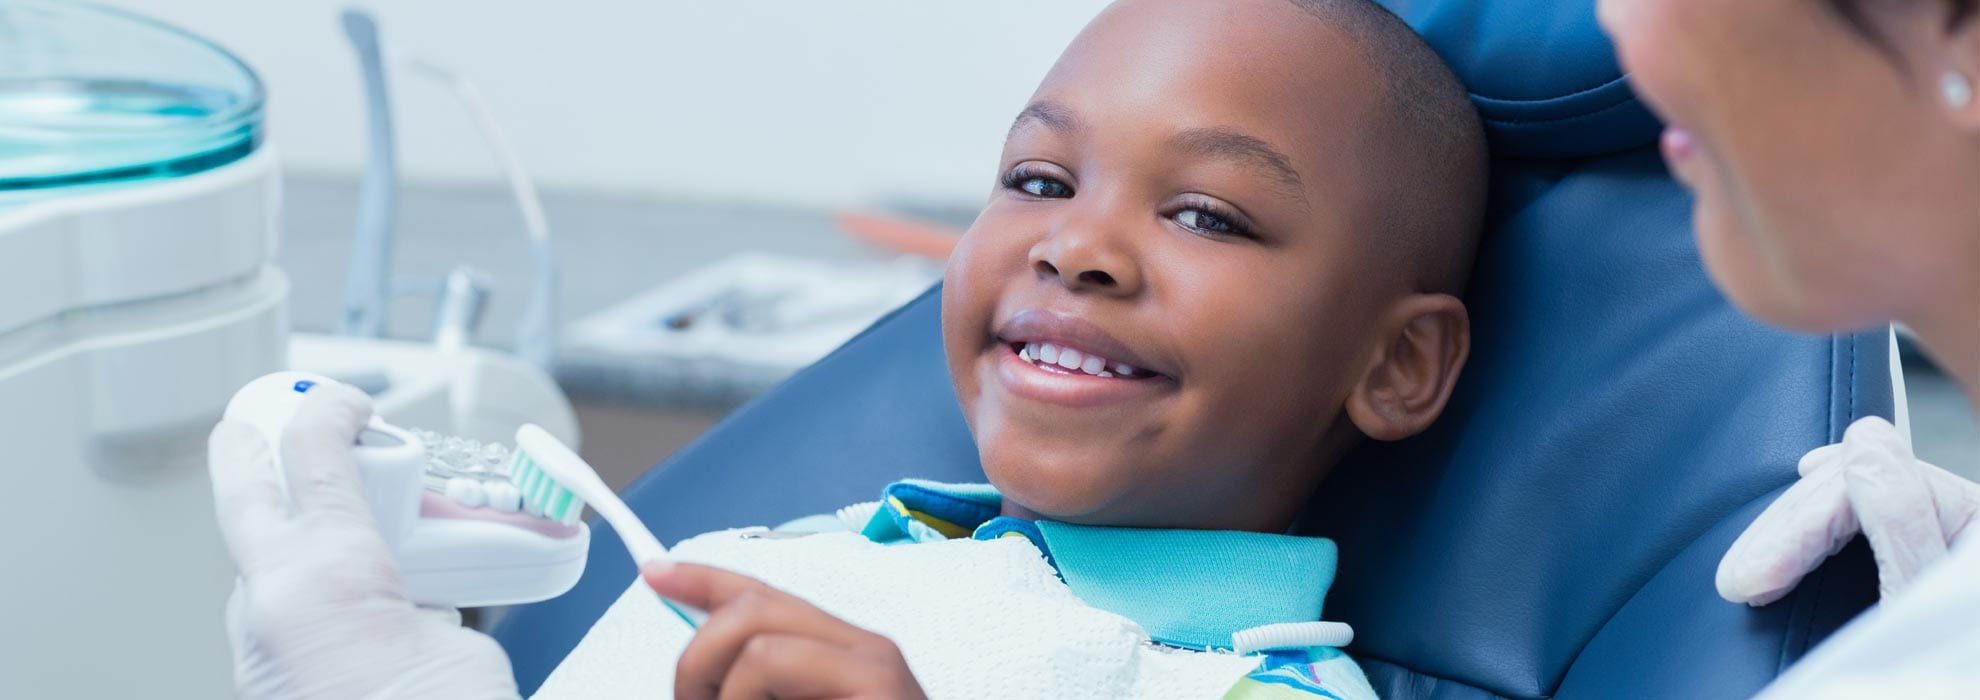 Rossitch Pediatric Dentistry